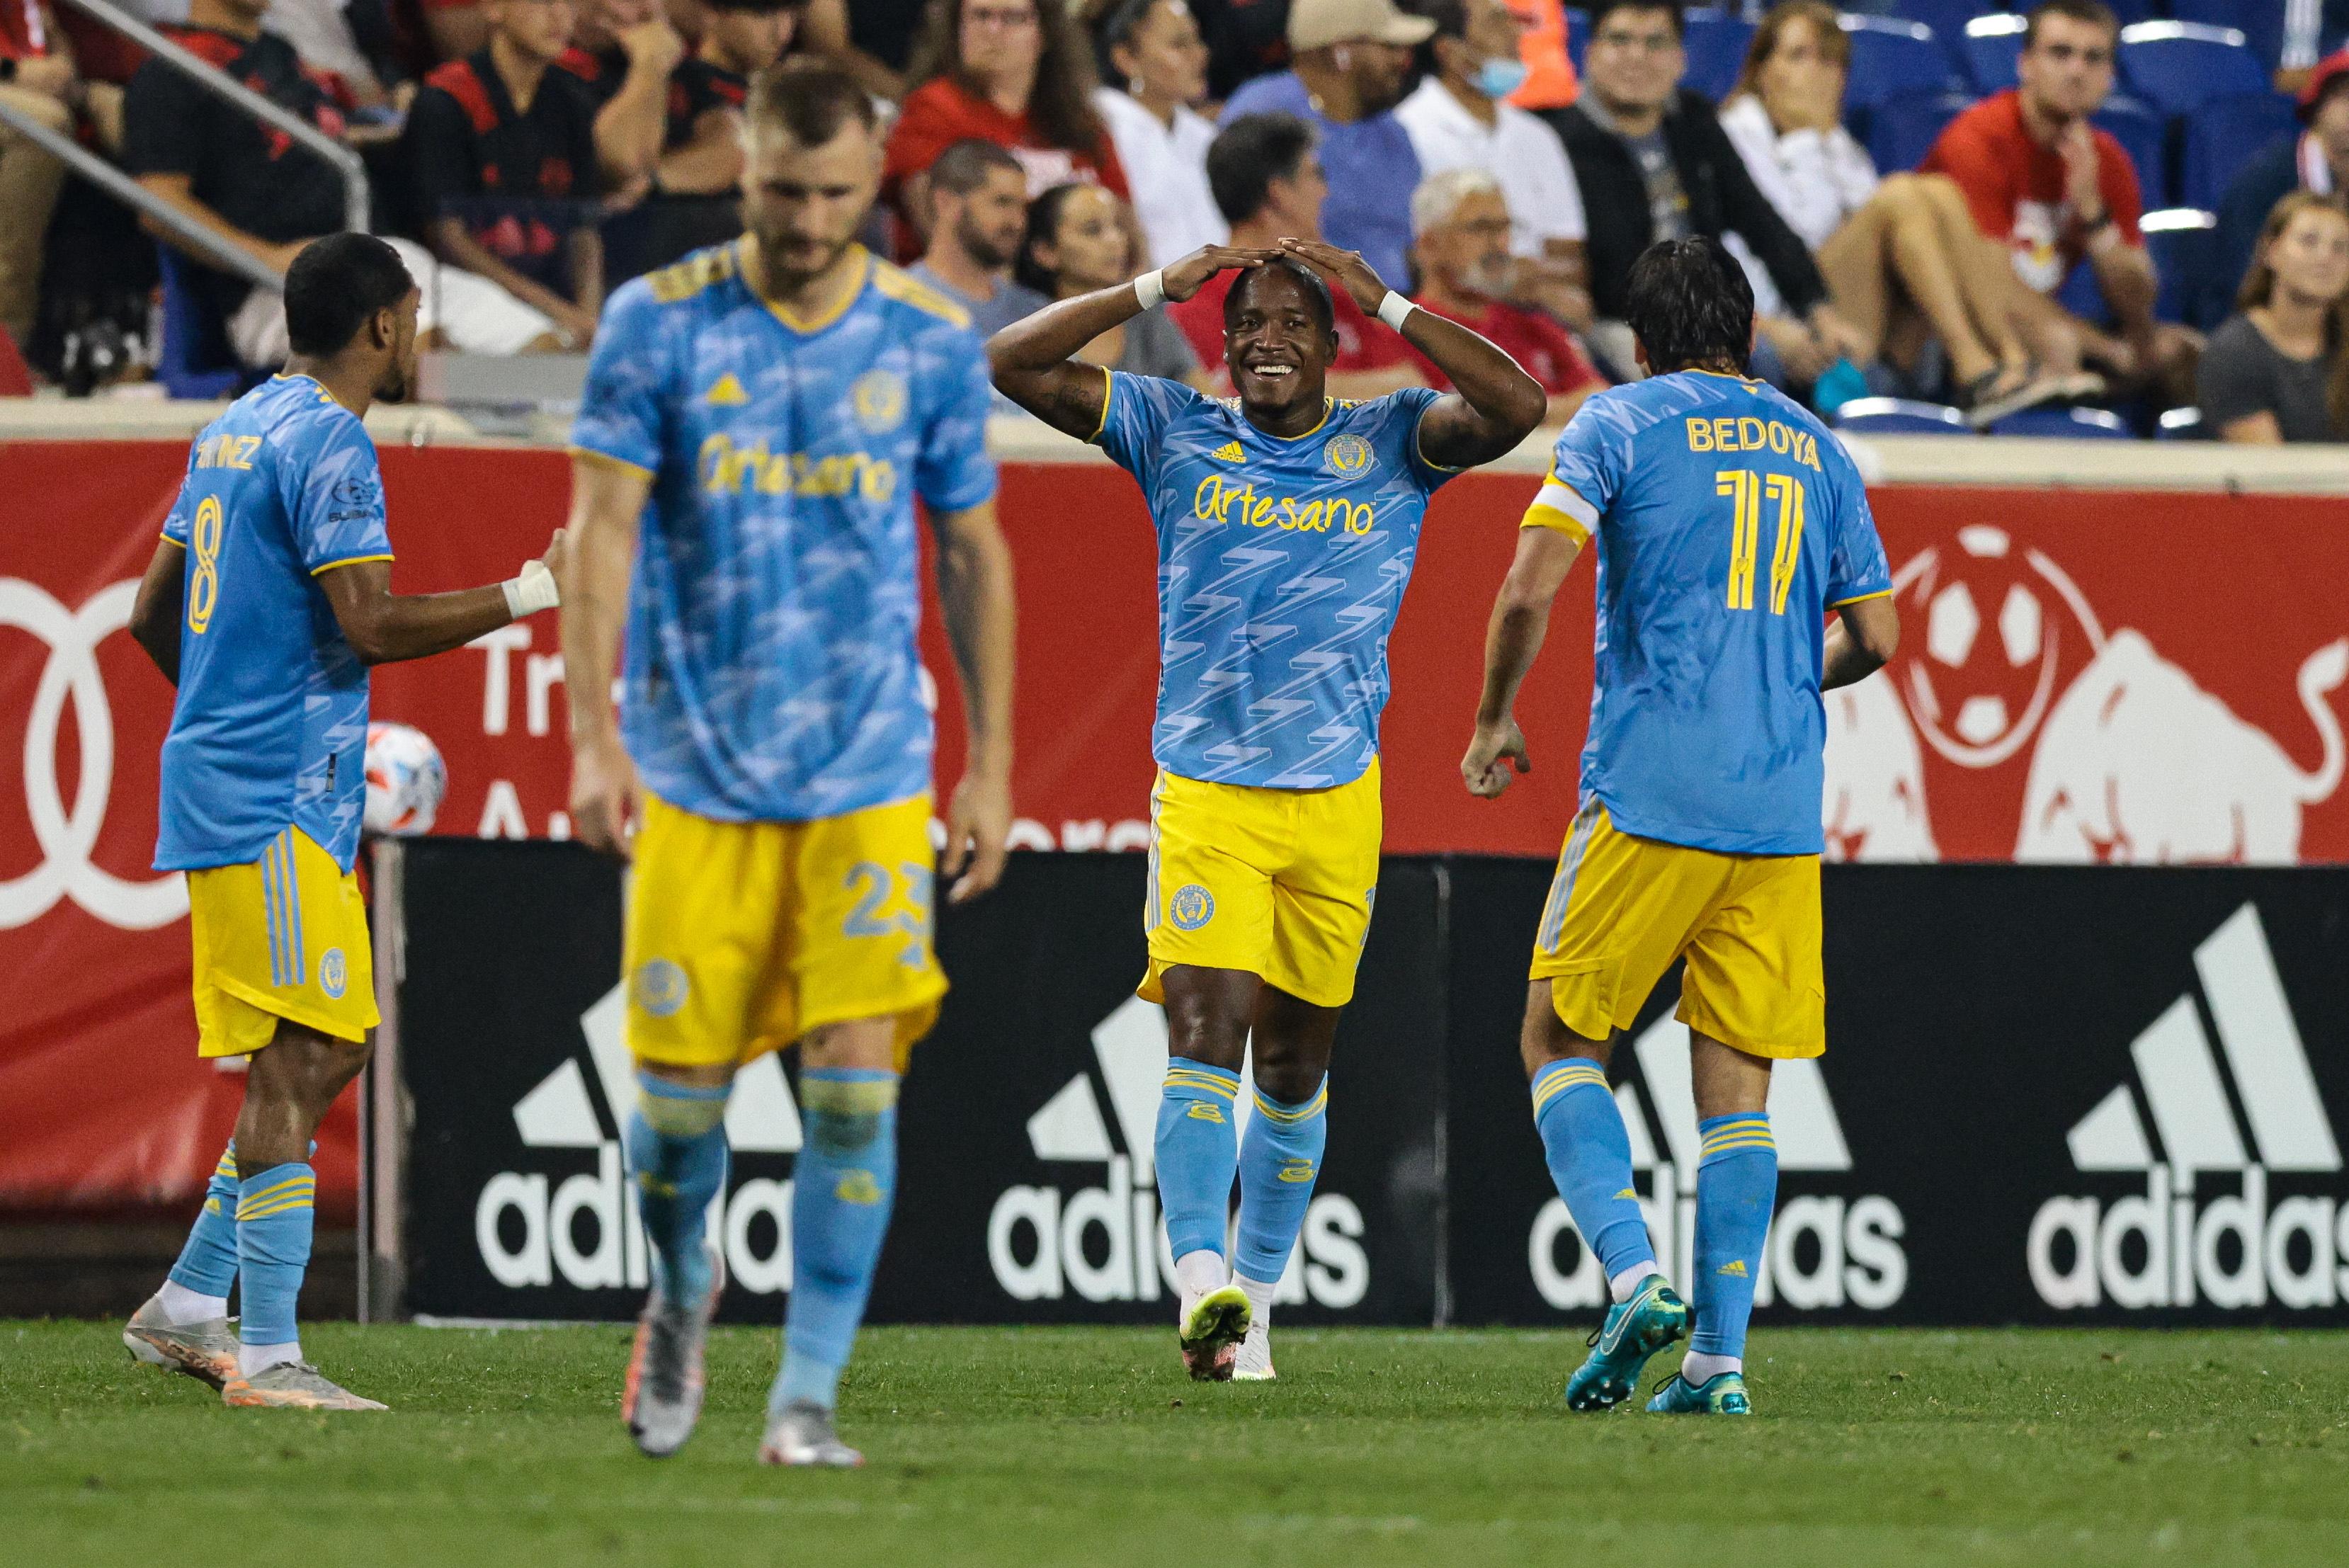 MLS: Philadelphia Union at New York Red Bulls